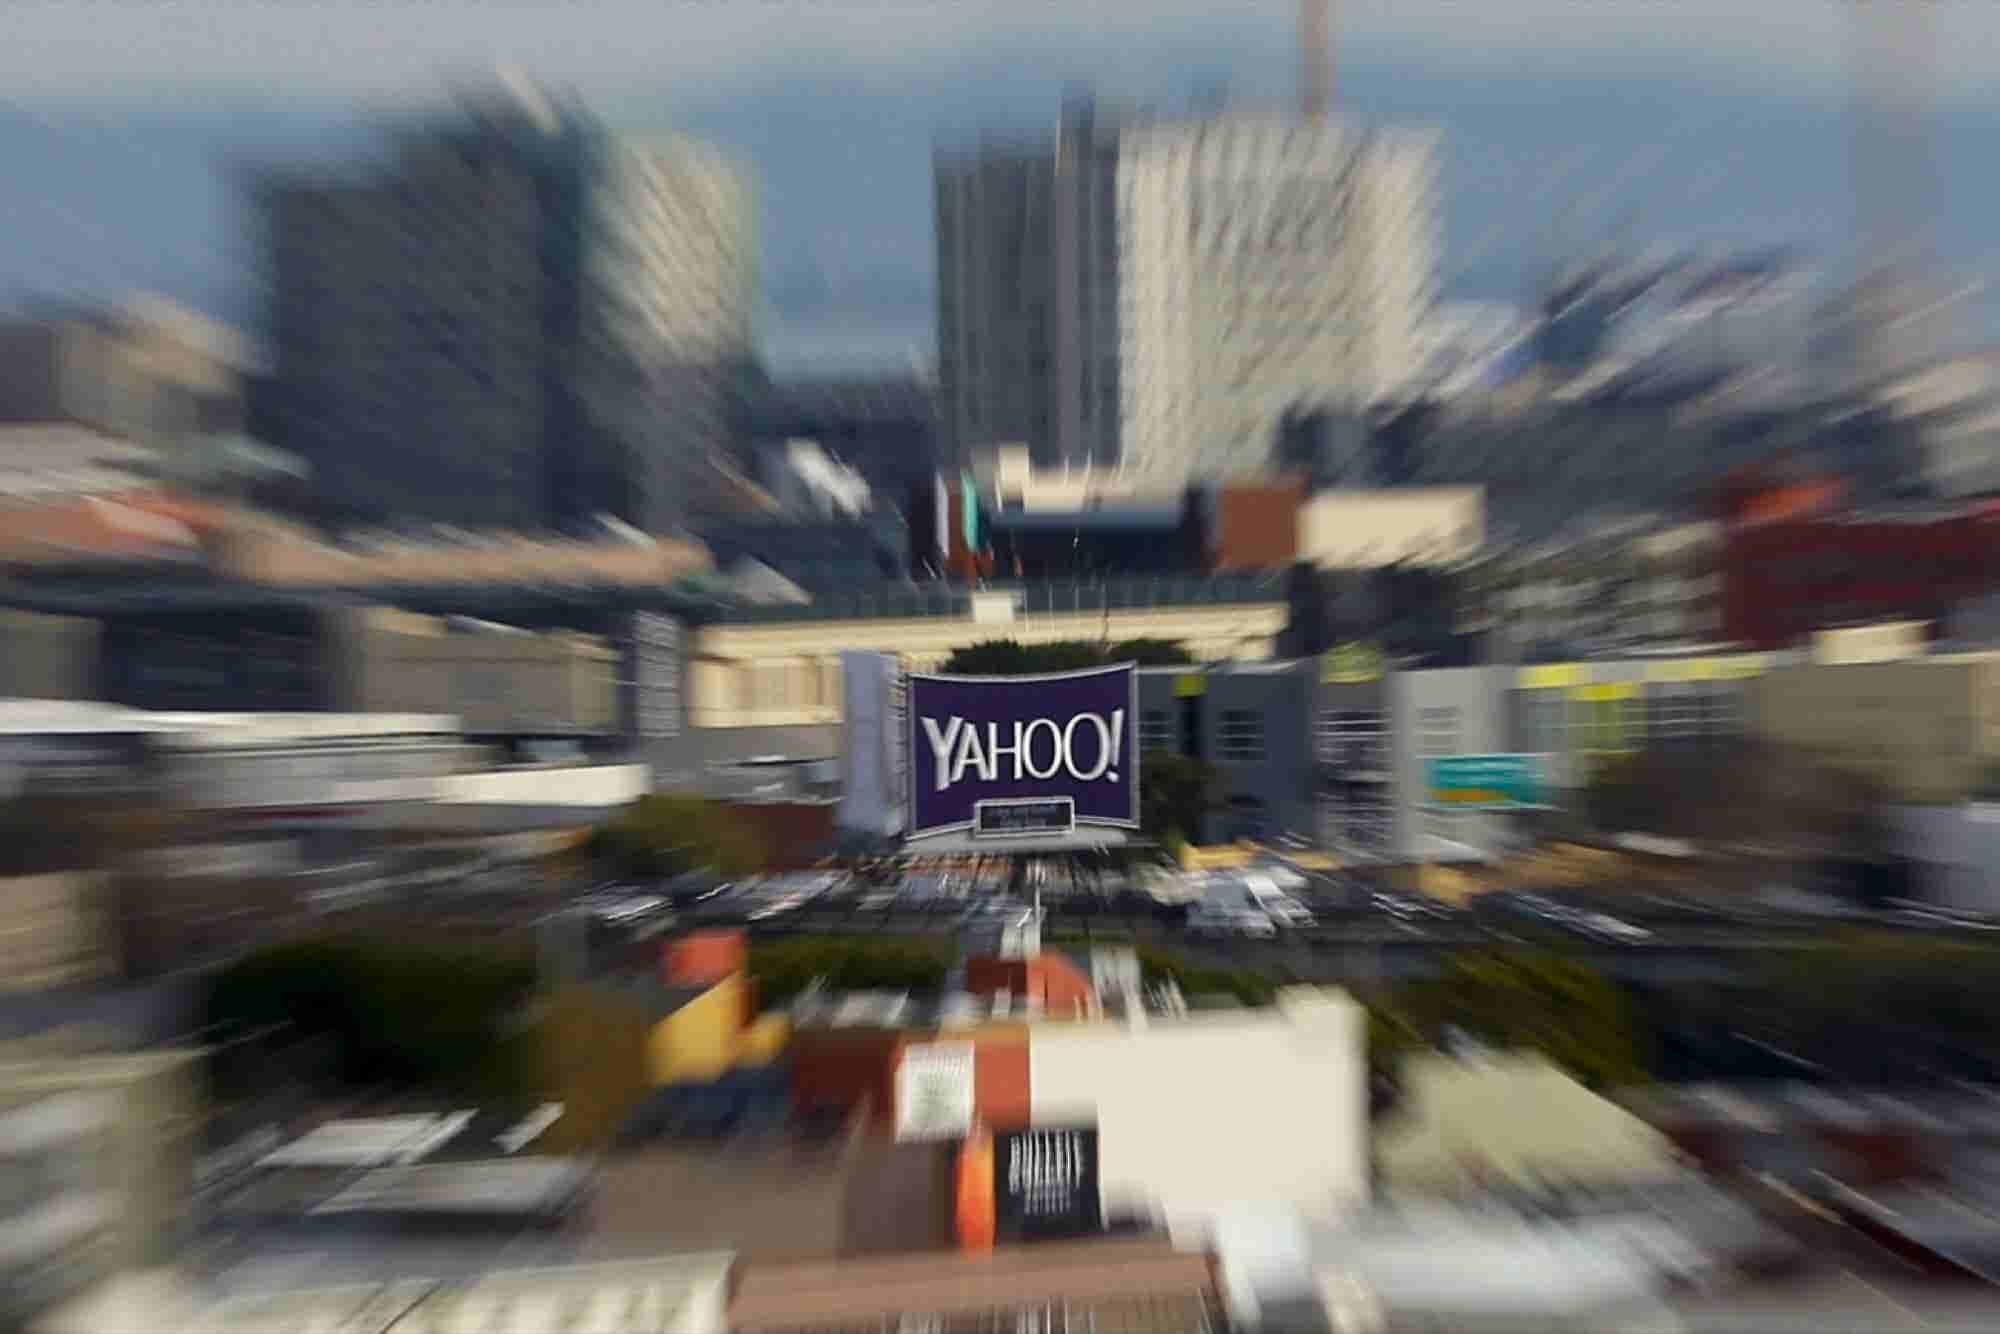 Yahoo Secretly Scanned Customer Emails for U.S. Intelligence